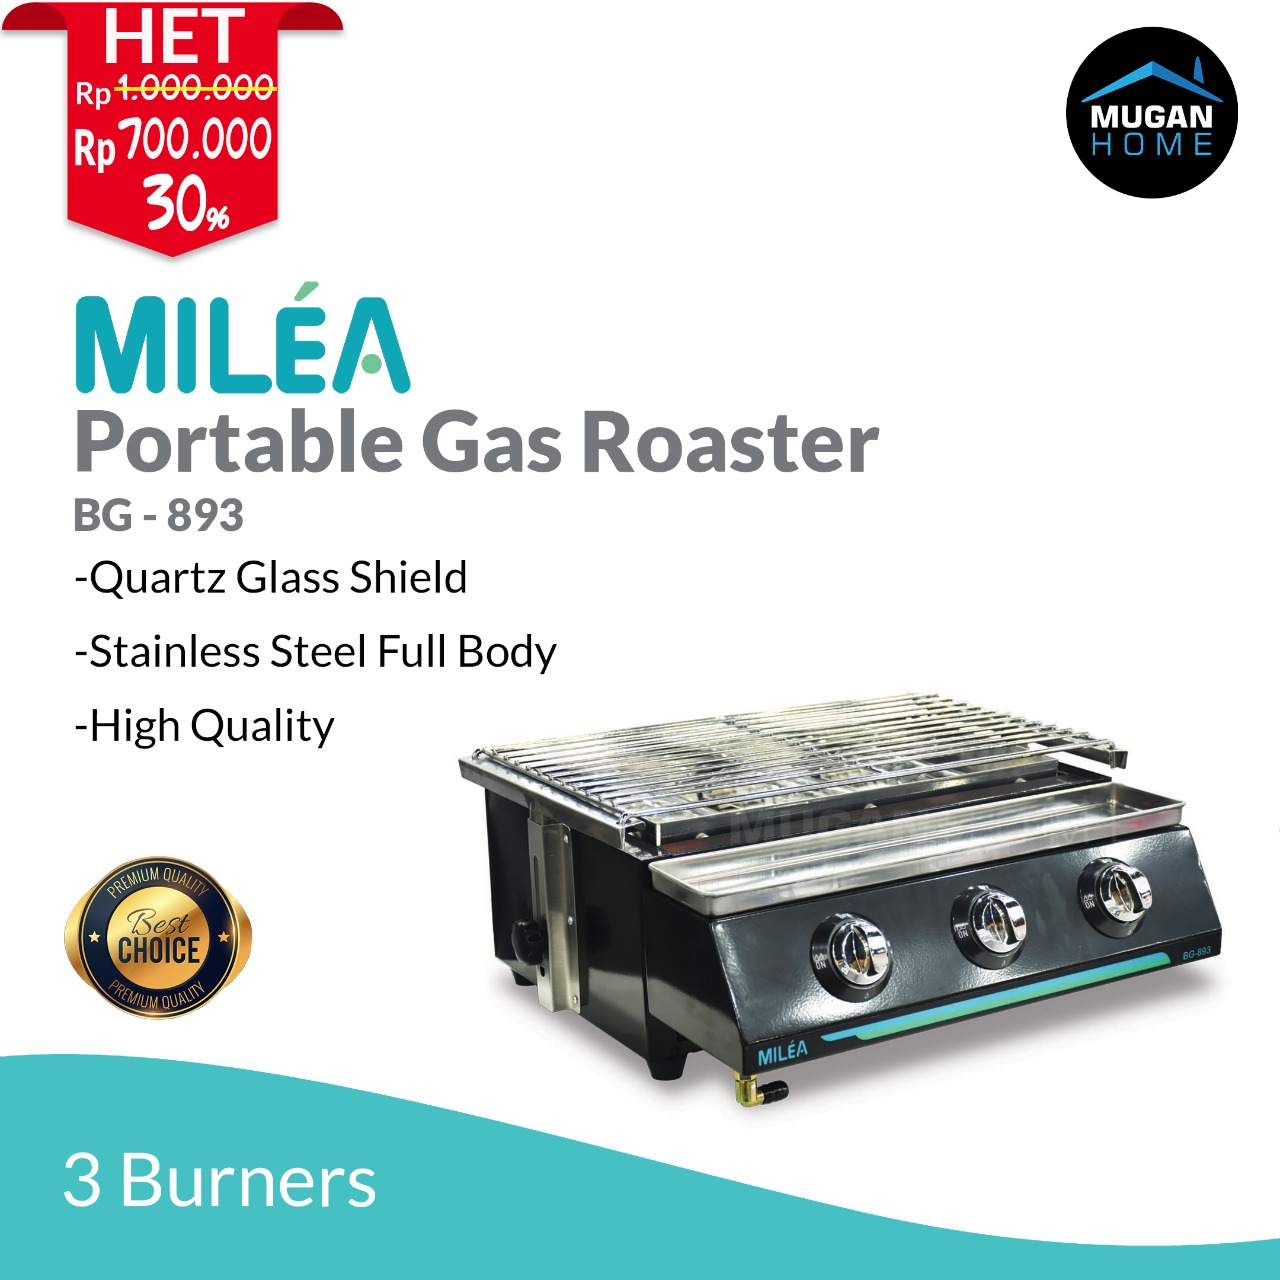 MILEA PORTABLE GAS ROASTER 3 BURNERS